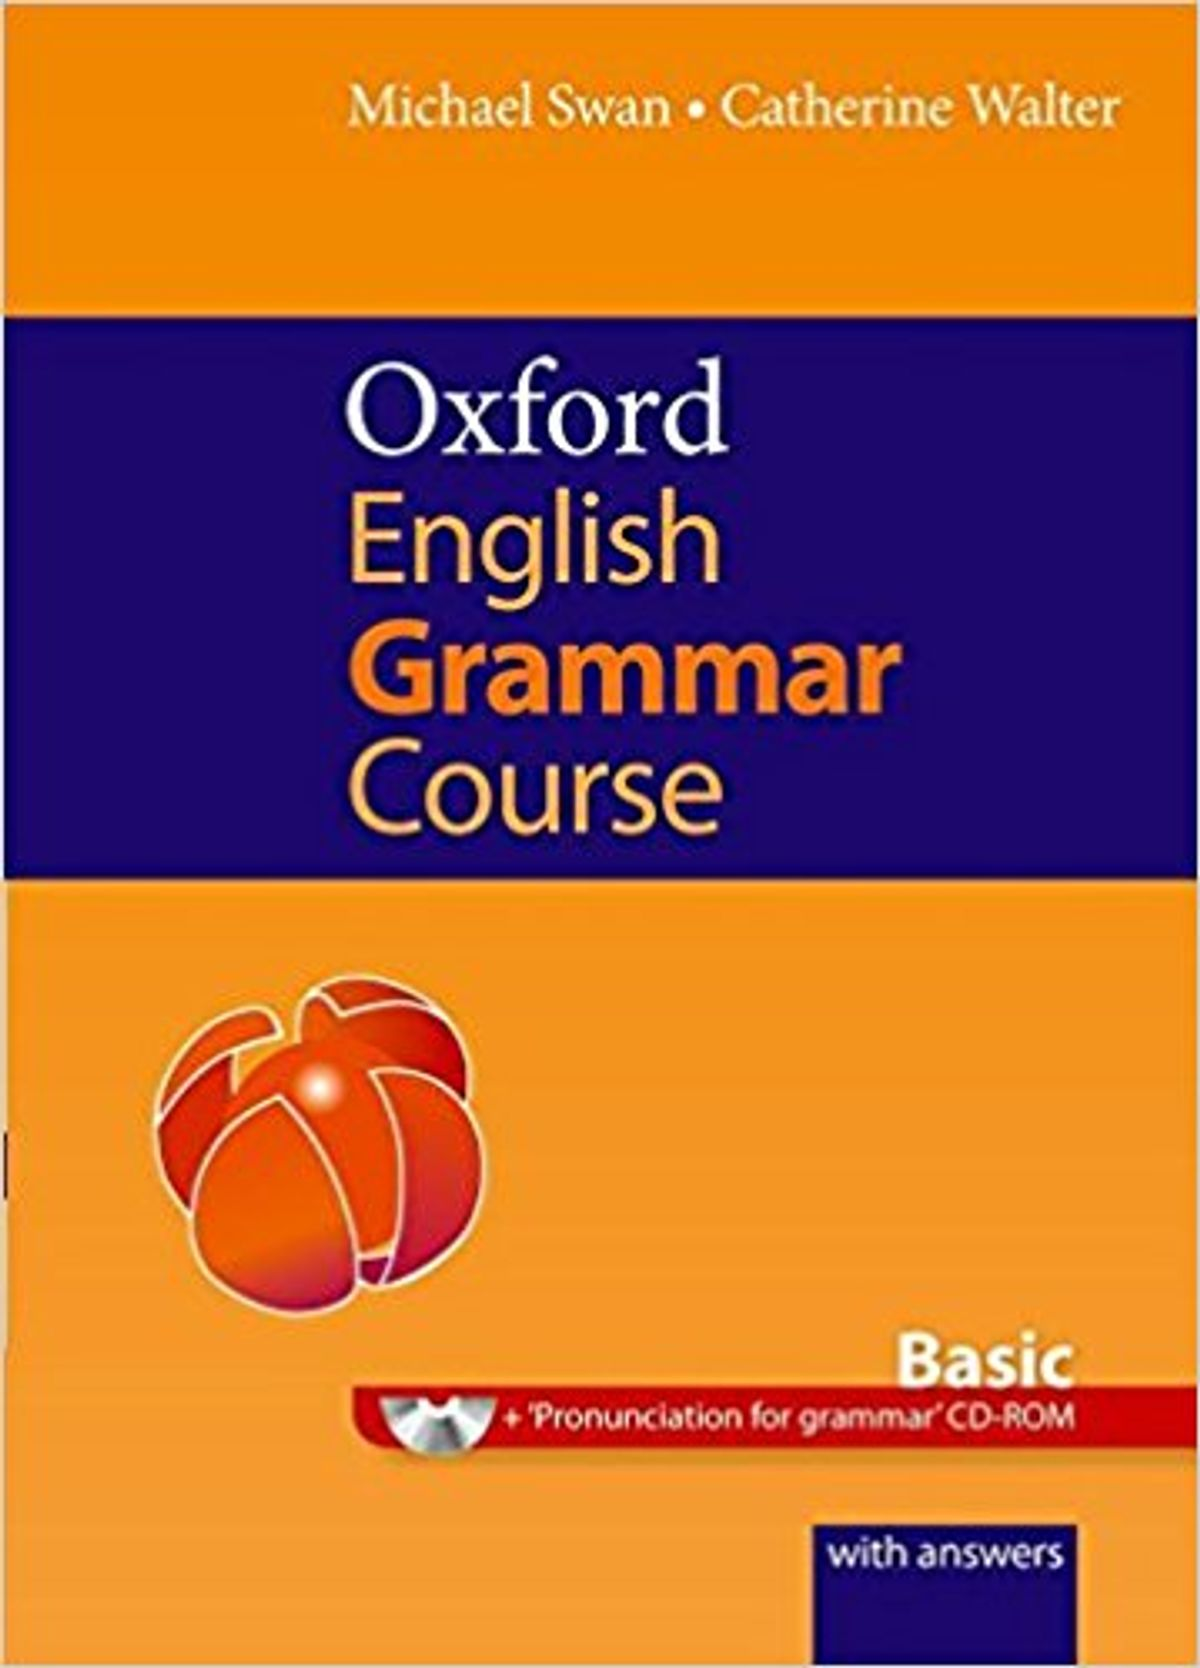 Oxford Grammar Course Basic کتاب گرامر مخصوص سطوح پایه Elementary